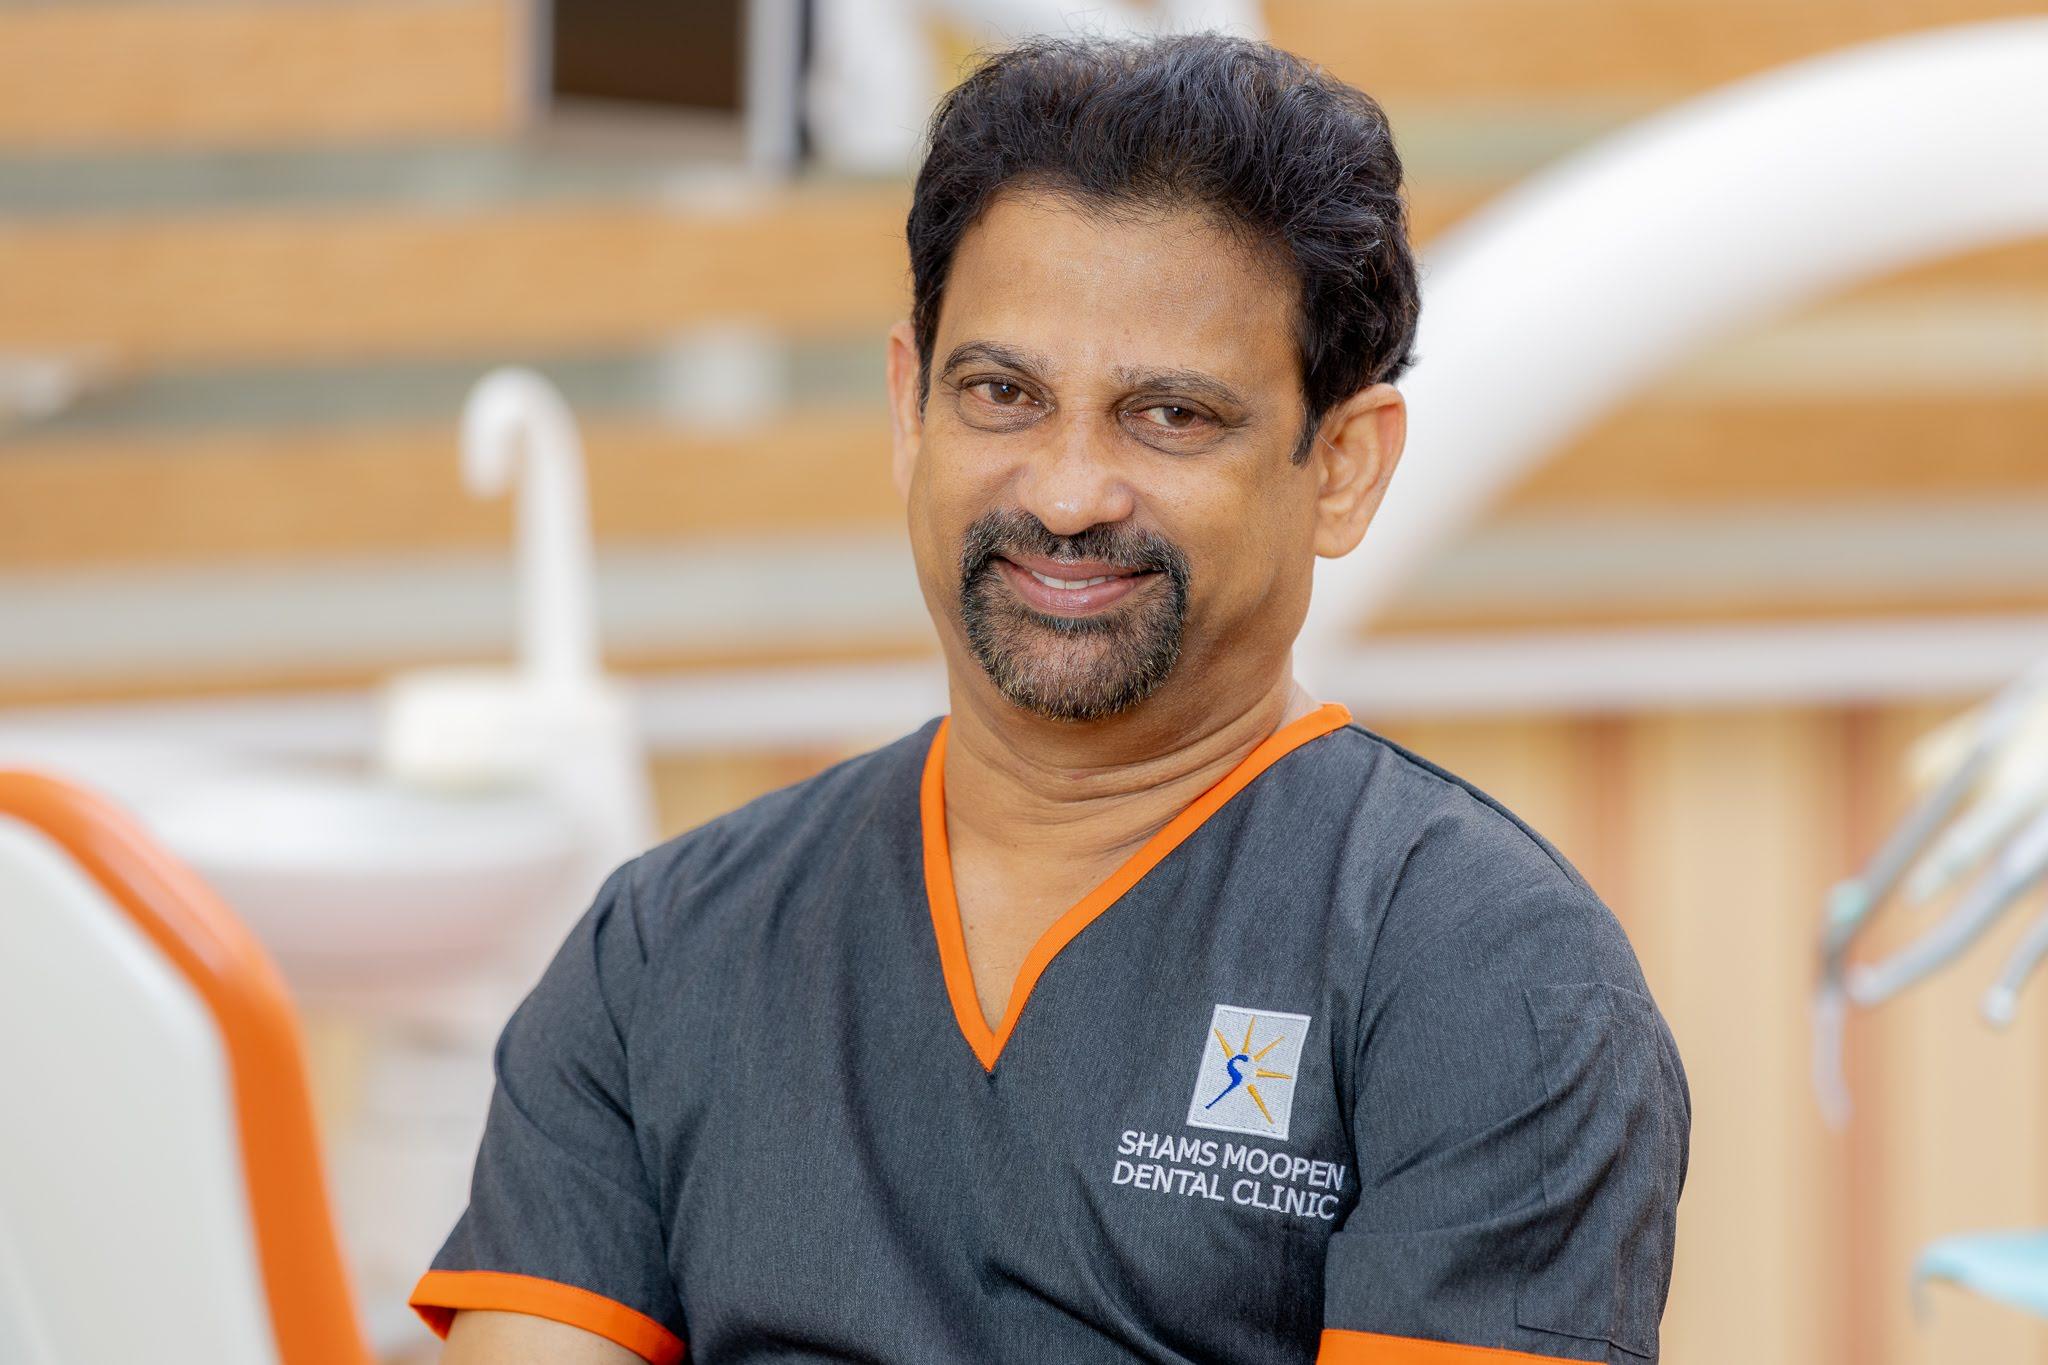 Dr Shams Moopen